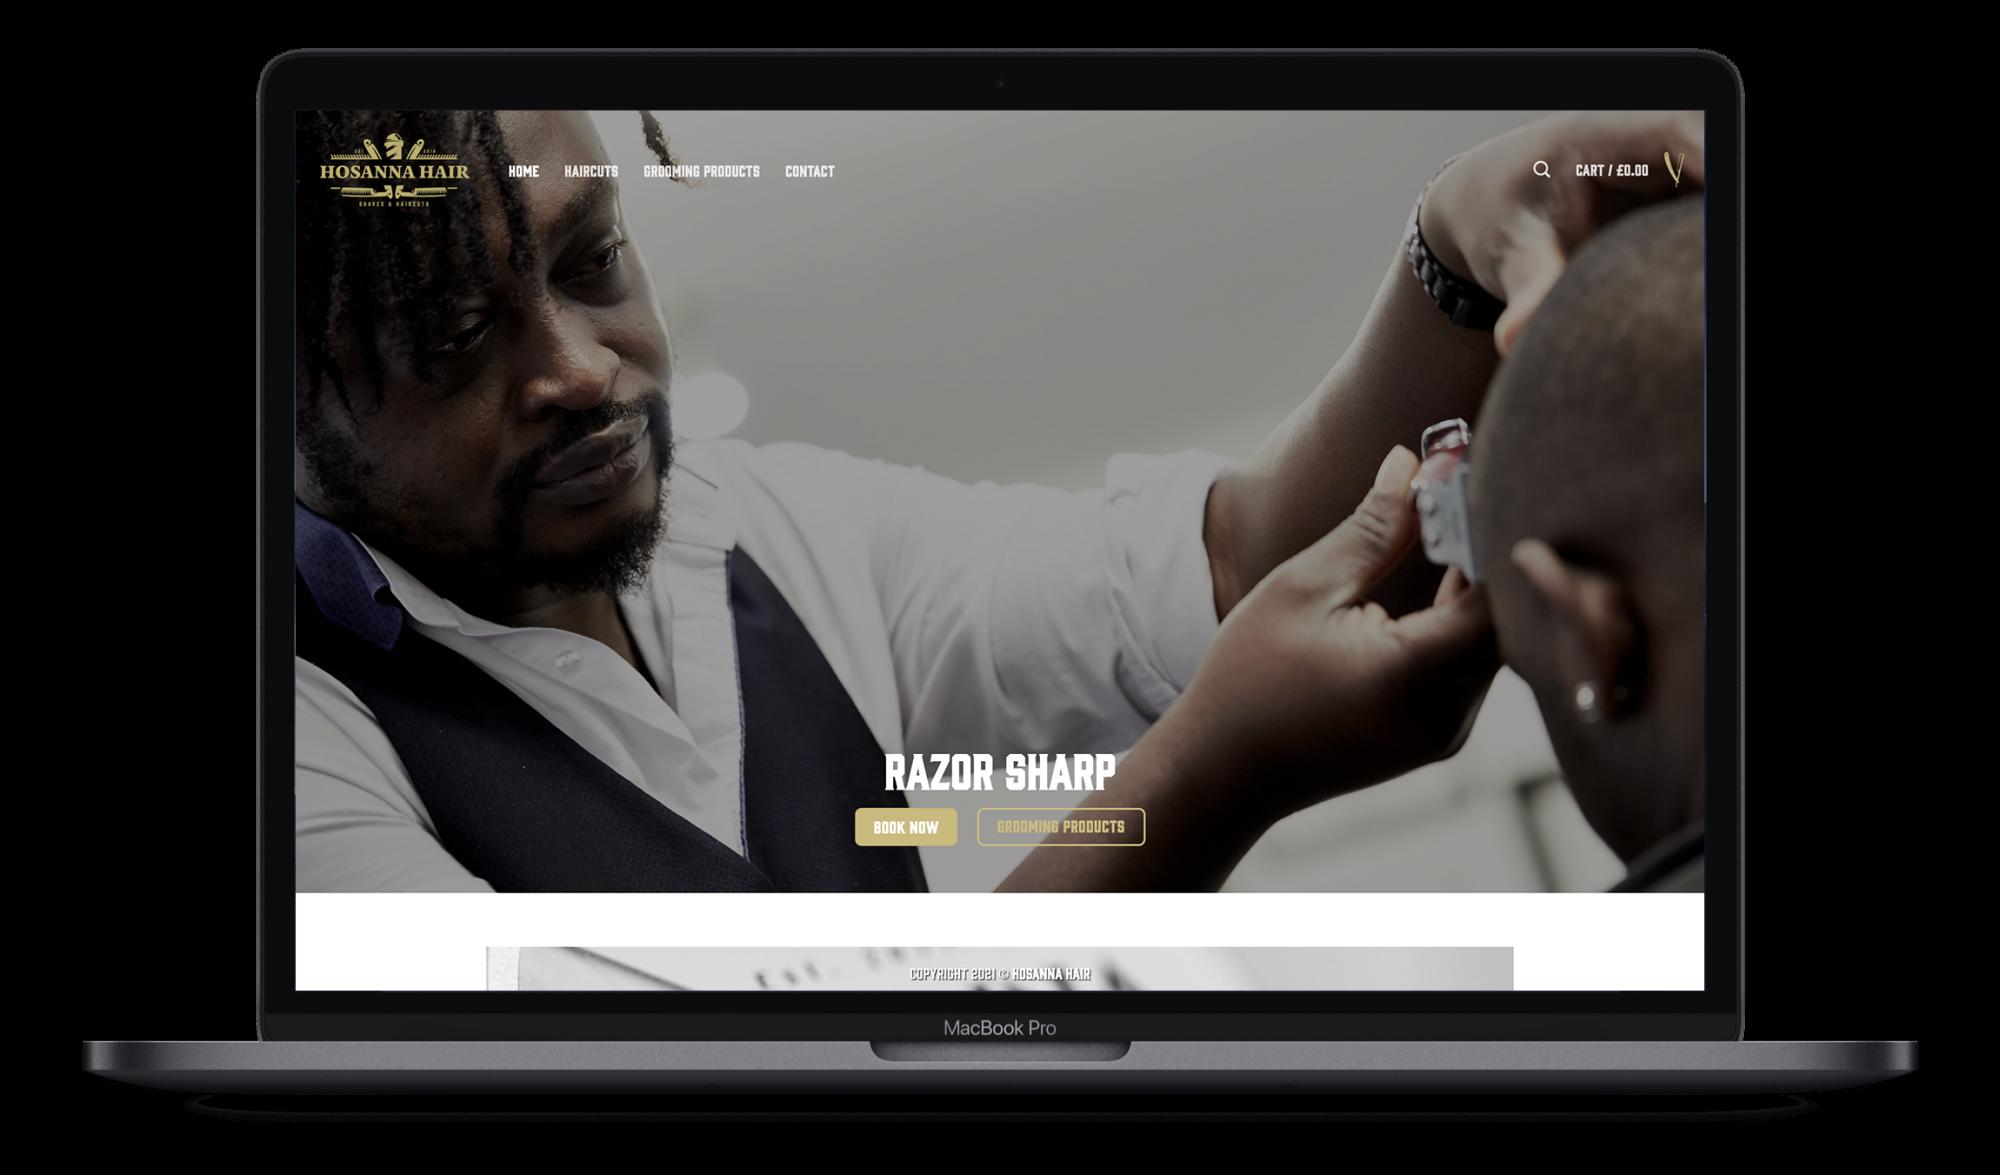 website design ribble valley callit creative mock up 88